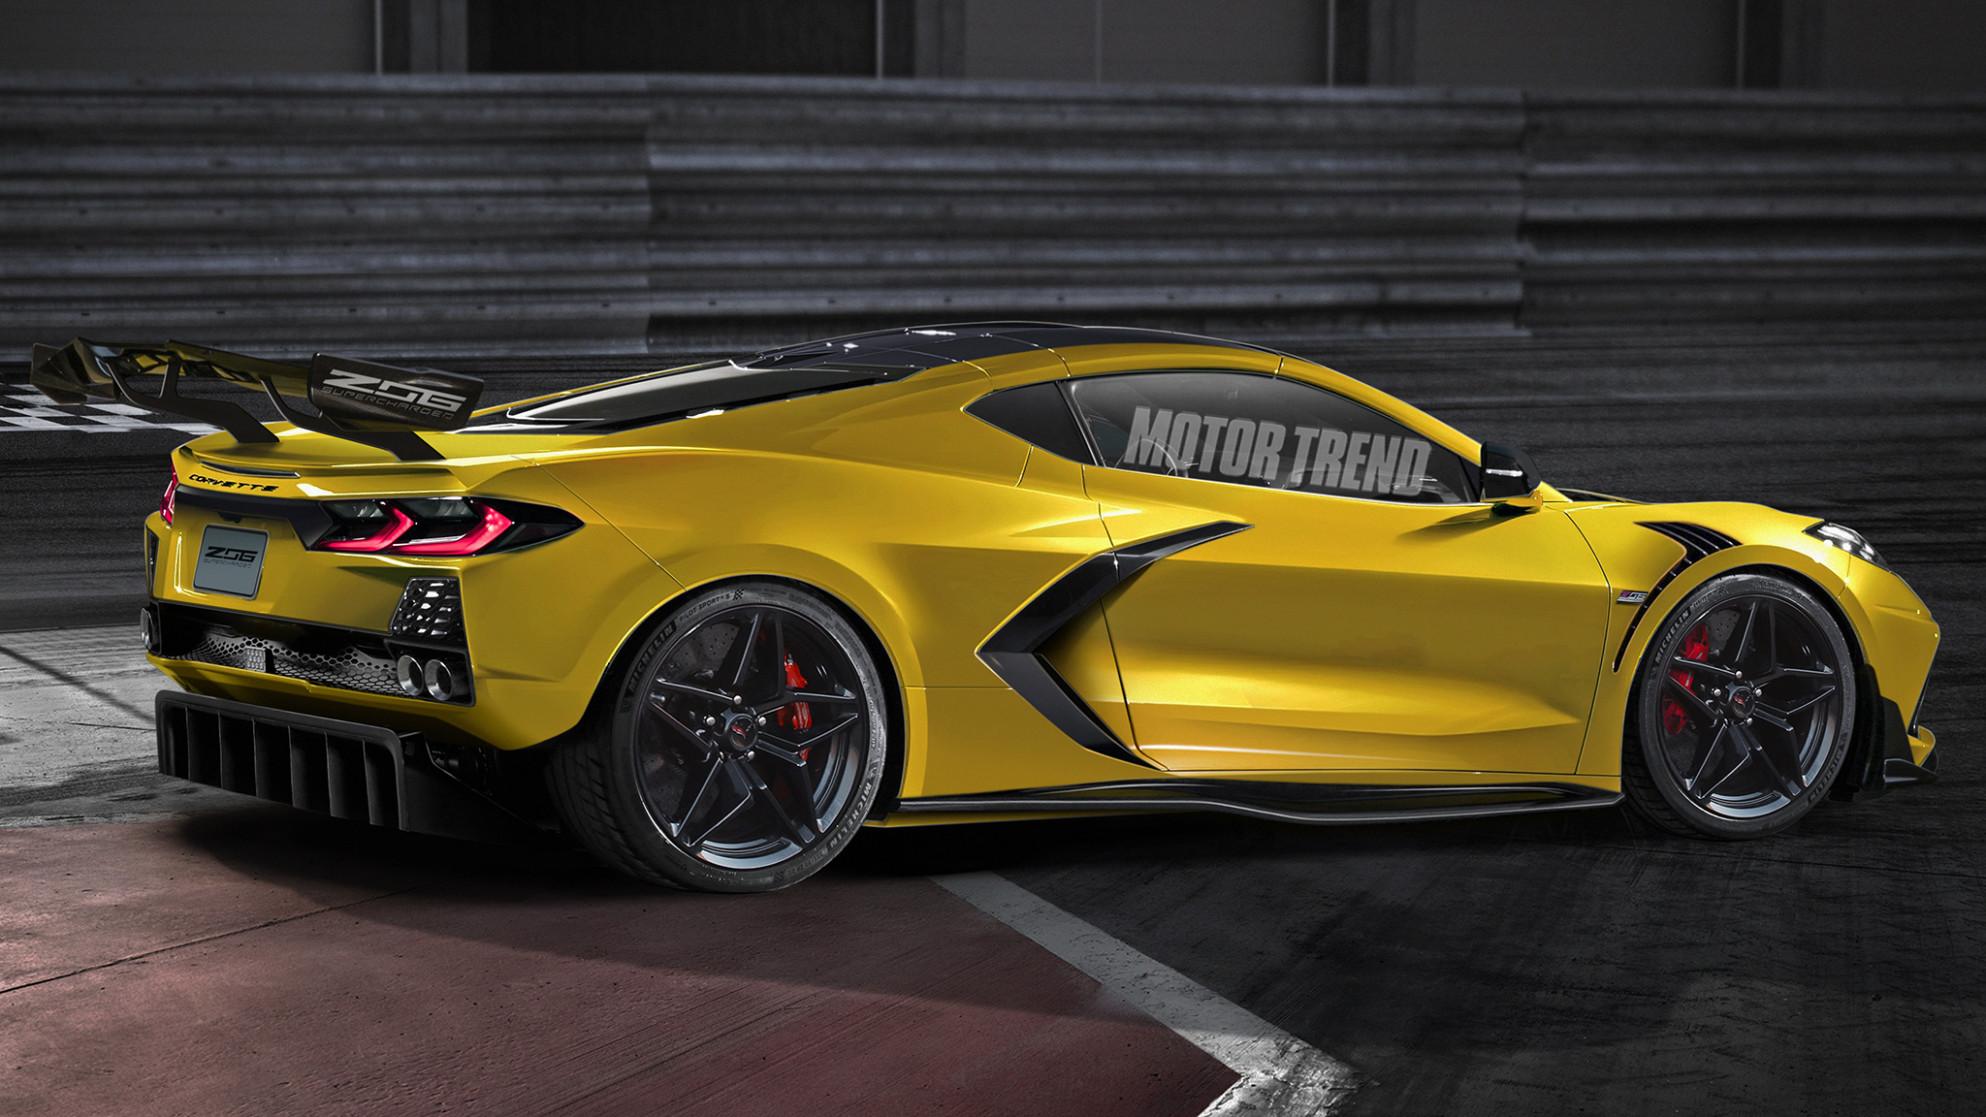 History 2022 Chevrolet Corvette Zora Zr1 | New Cars Design